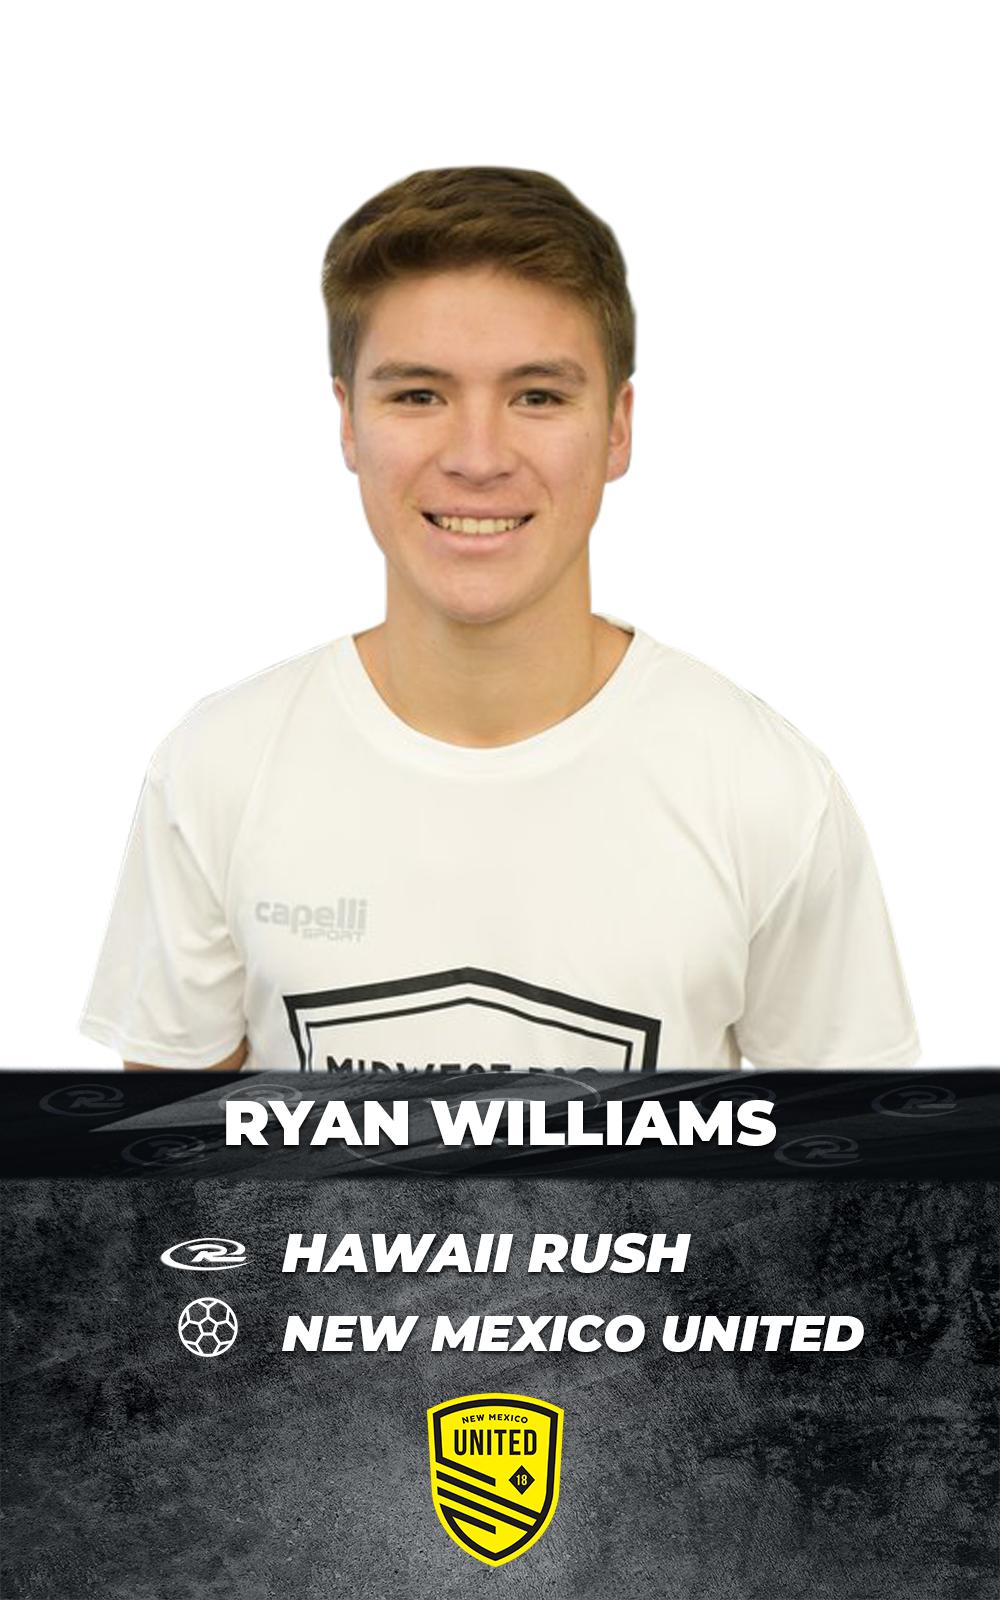 Ryan-williams